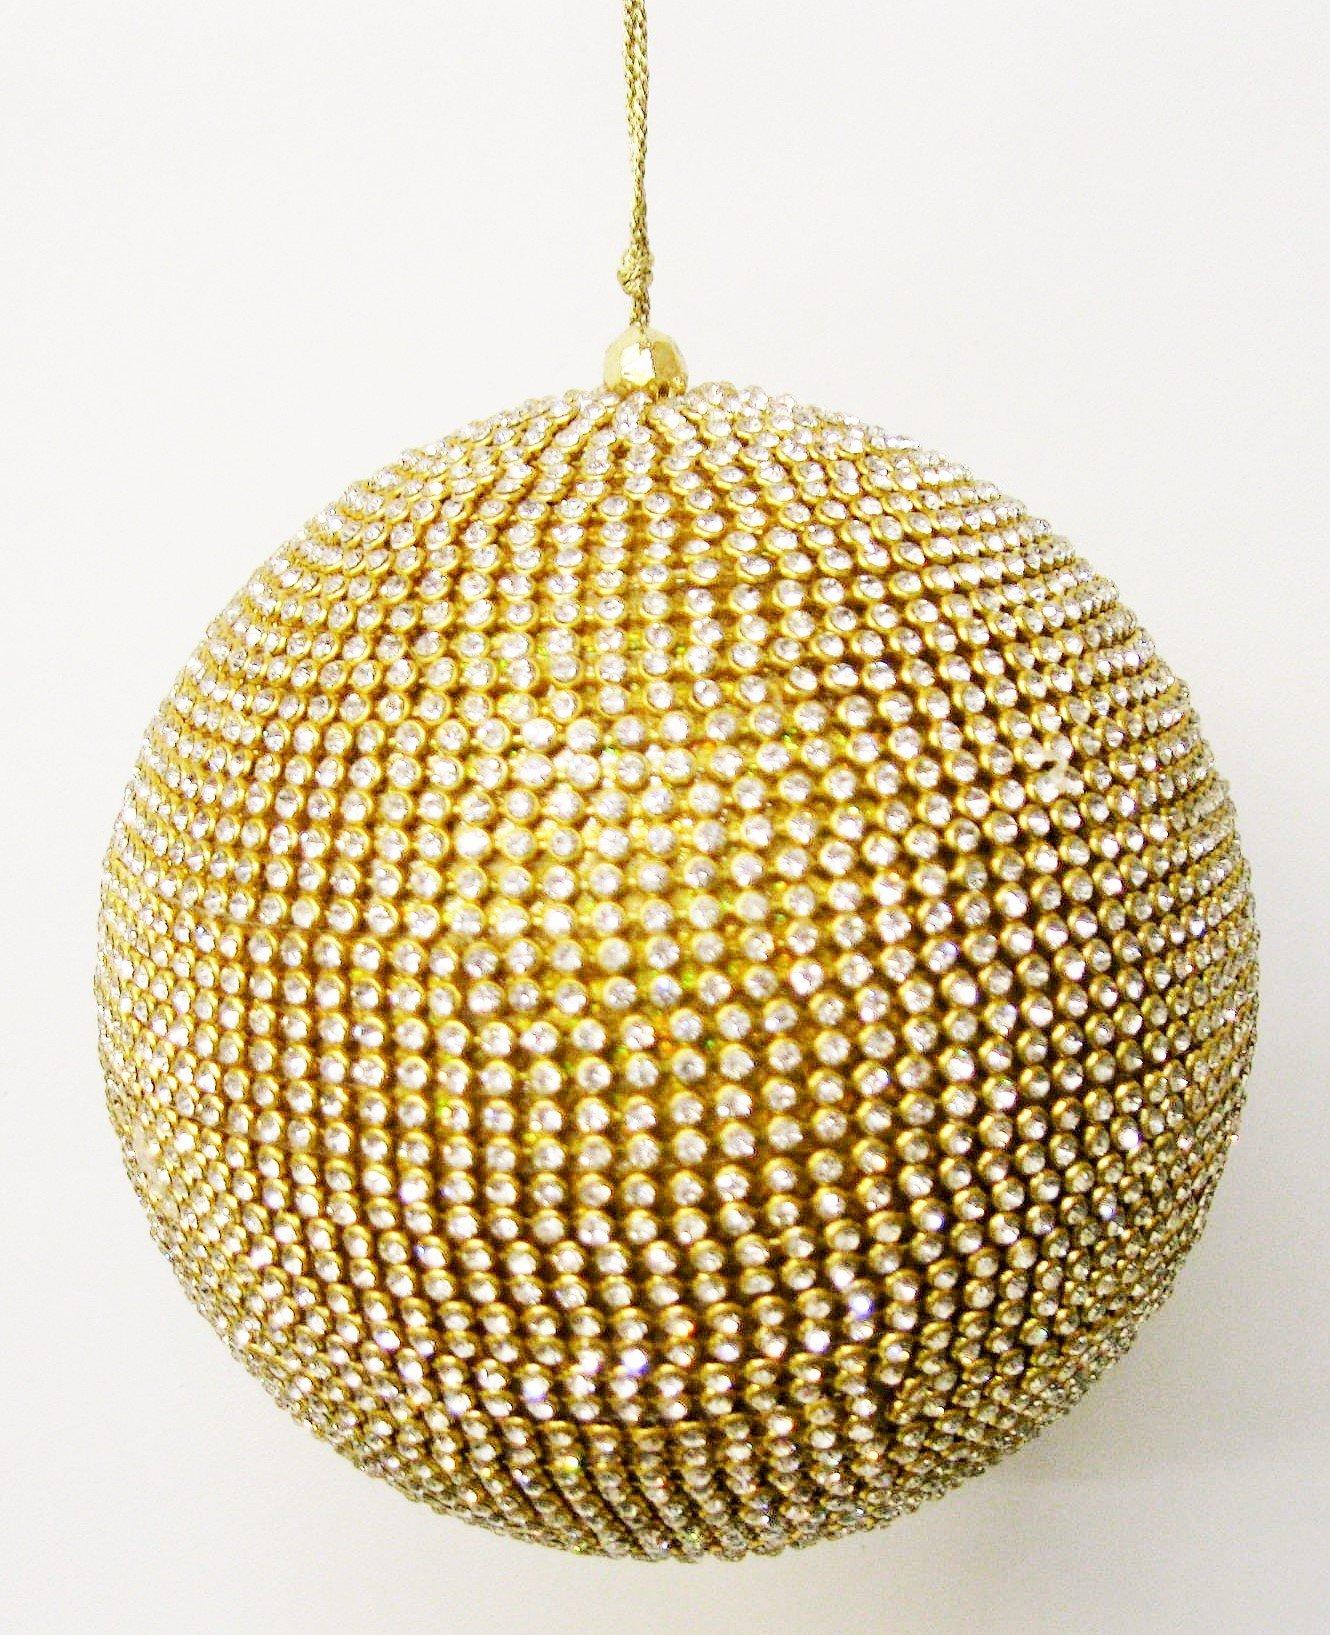 Gilded Rhinestone Christmas Ornament 5'' diameter CHOICE OF WHITE OR RED RHINESTONES (white)